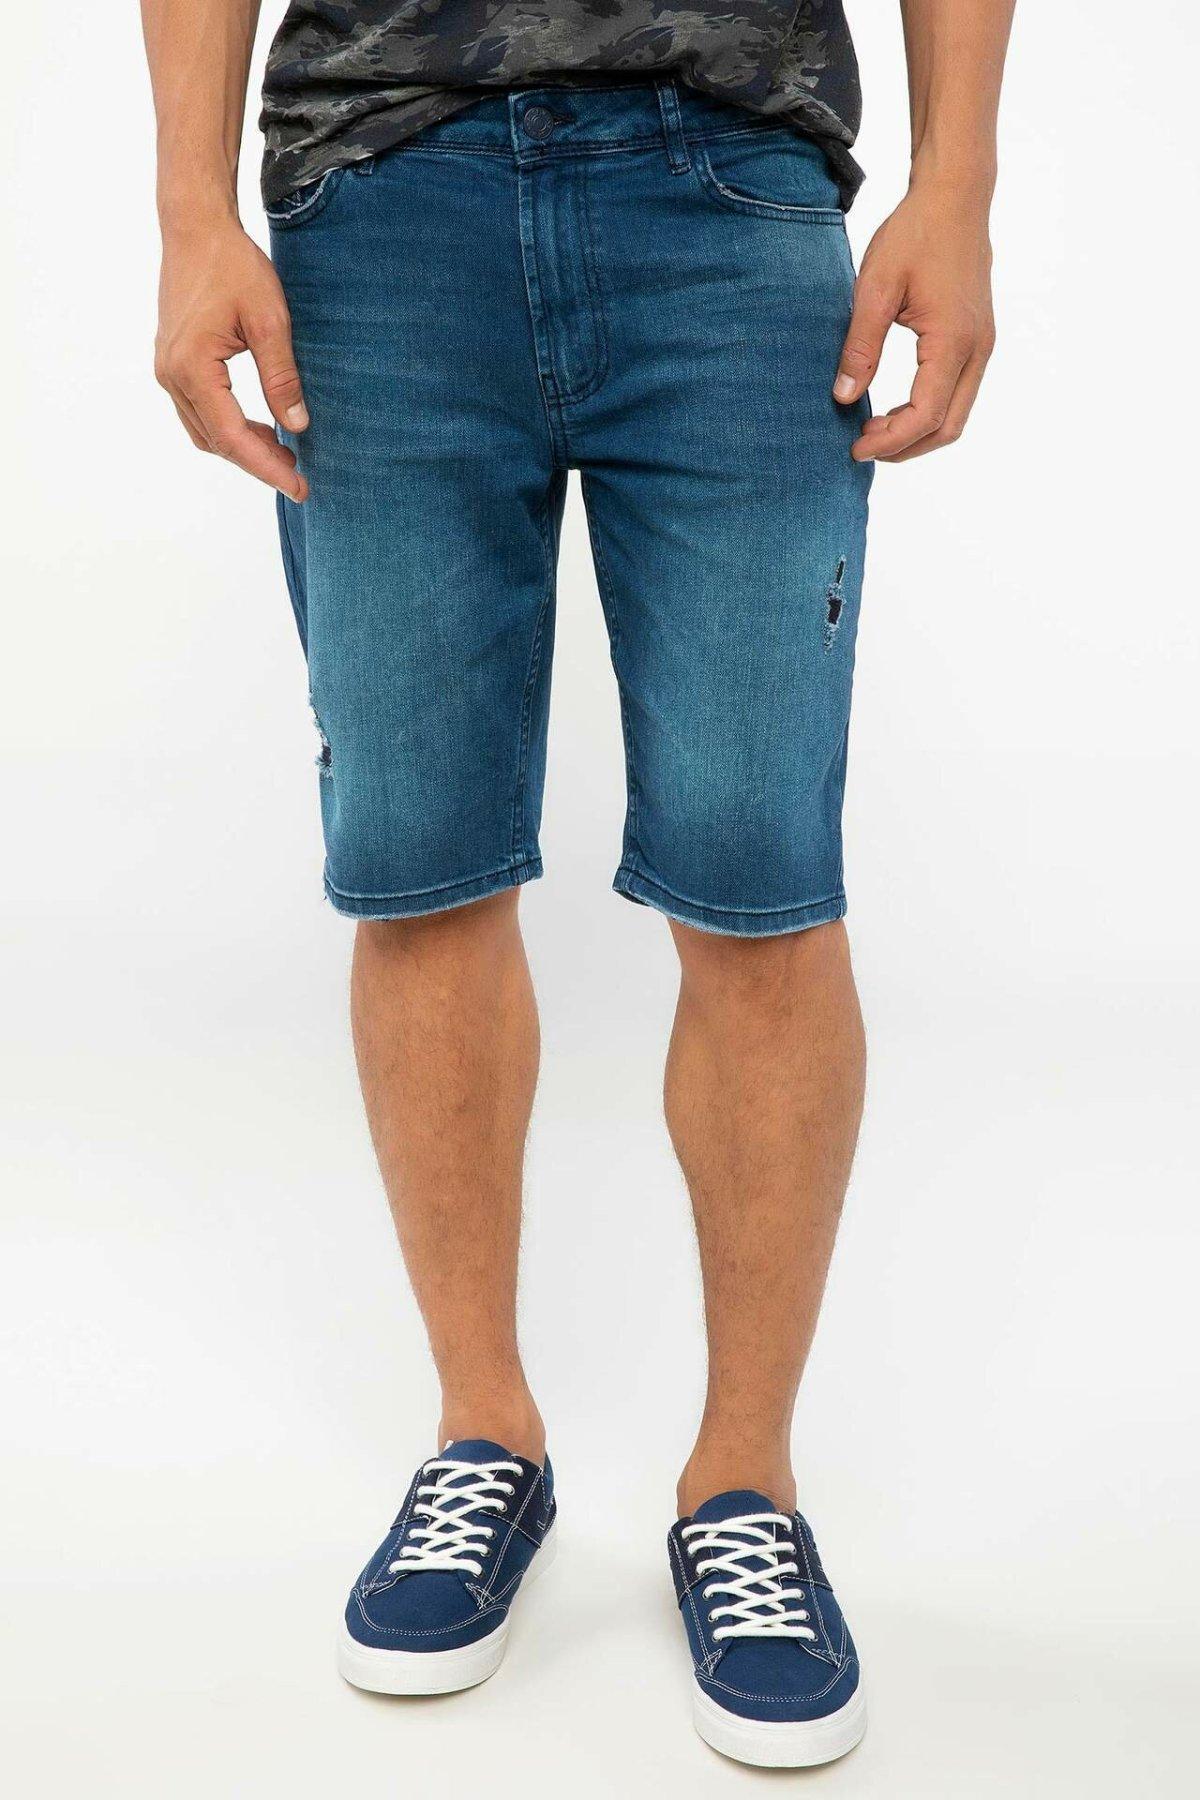 DeFacto Man Summer Washed Blue Denim Bottom Shorts Men Casual Soft Denim Bottoms Male Bermuda Shorts-I8824AZ18SM